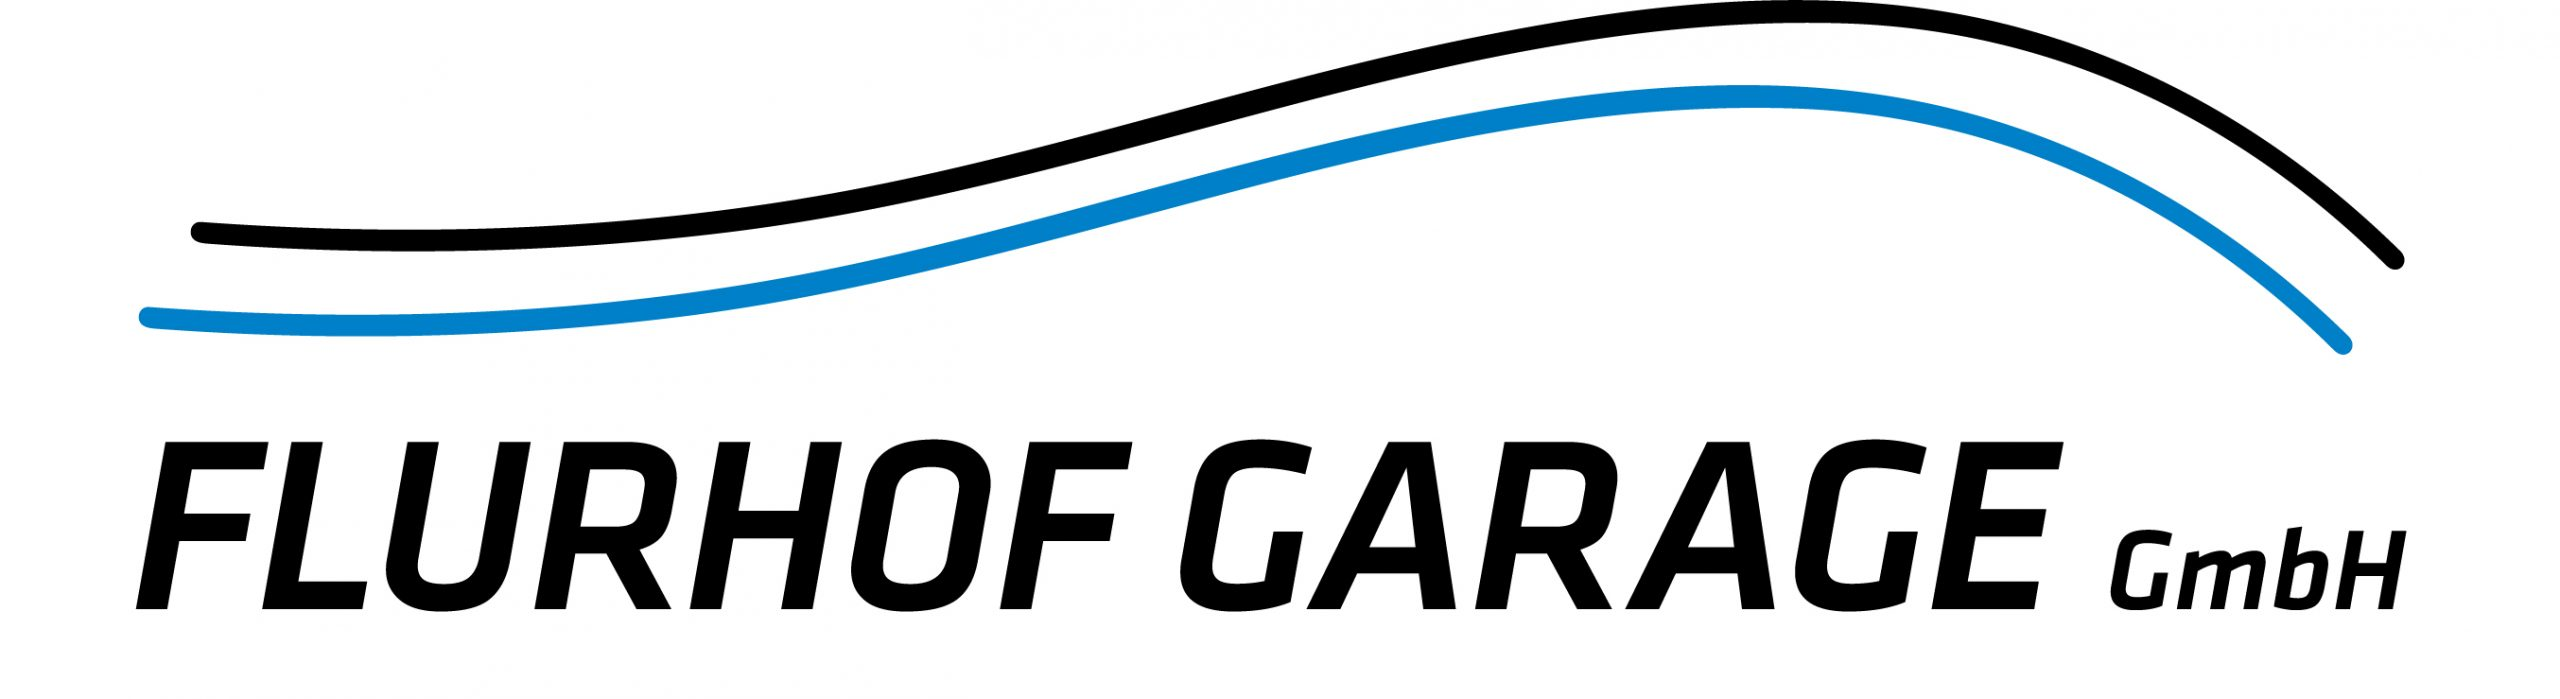 Logo Flurhof Garage GmbH